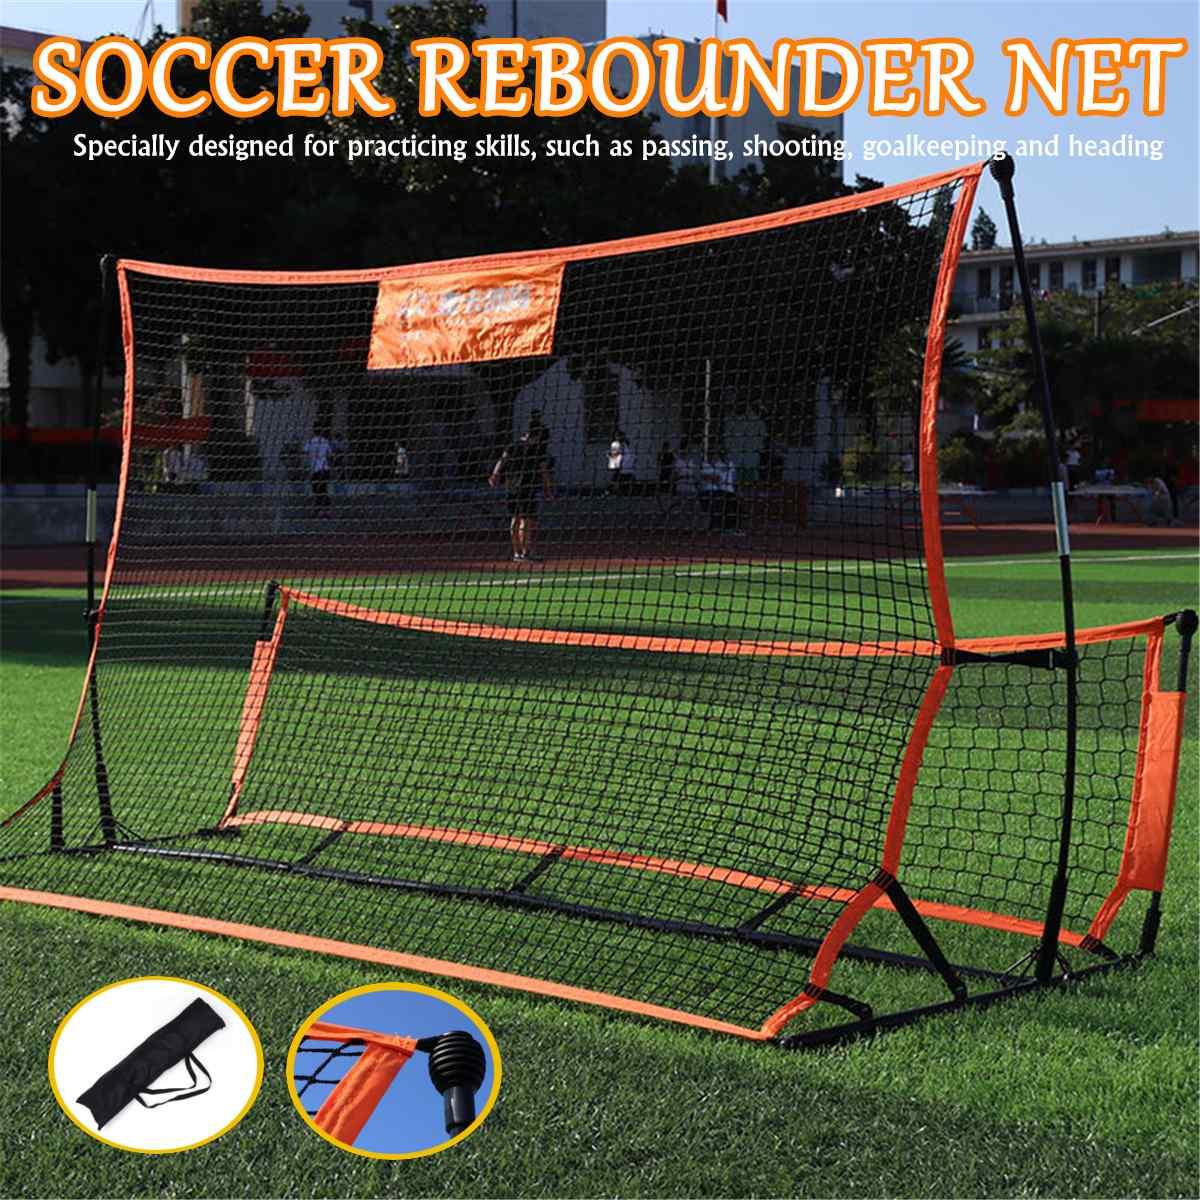 Target Soccer Football Rebounder Net Volley Training Portable Soccer-Ball Target Rebound Foot Aid-Tool